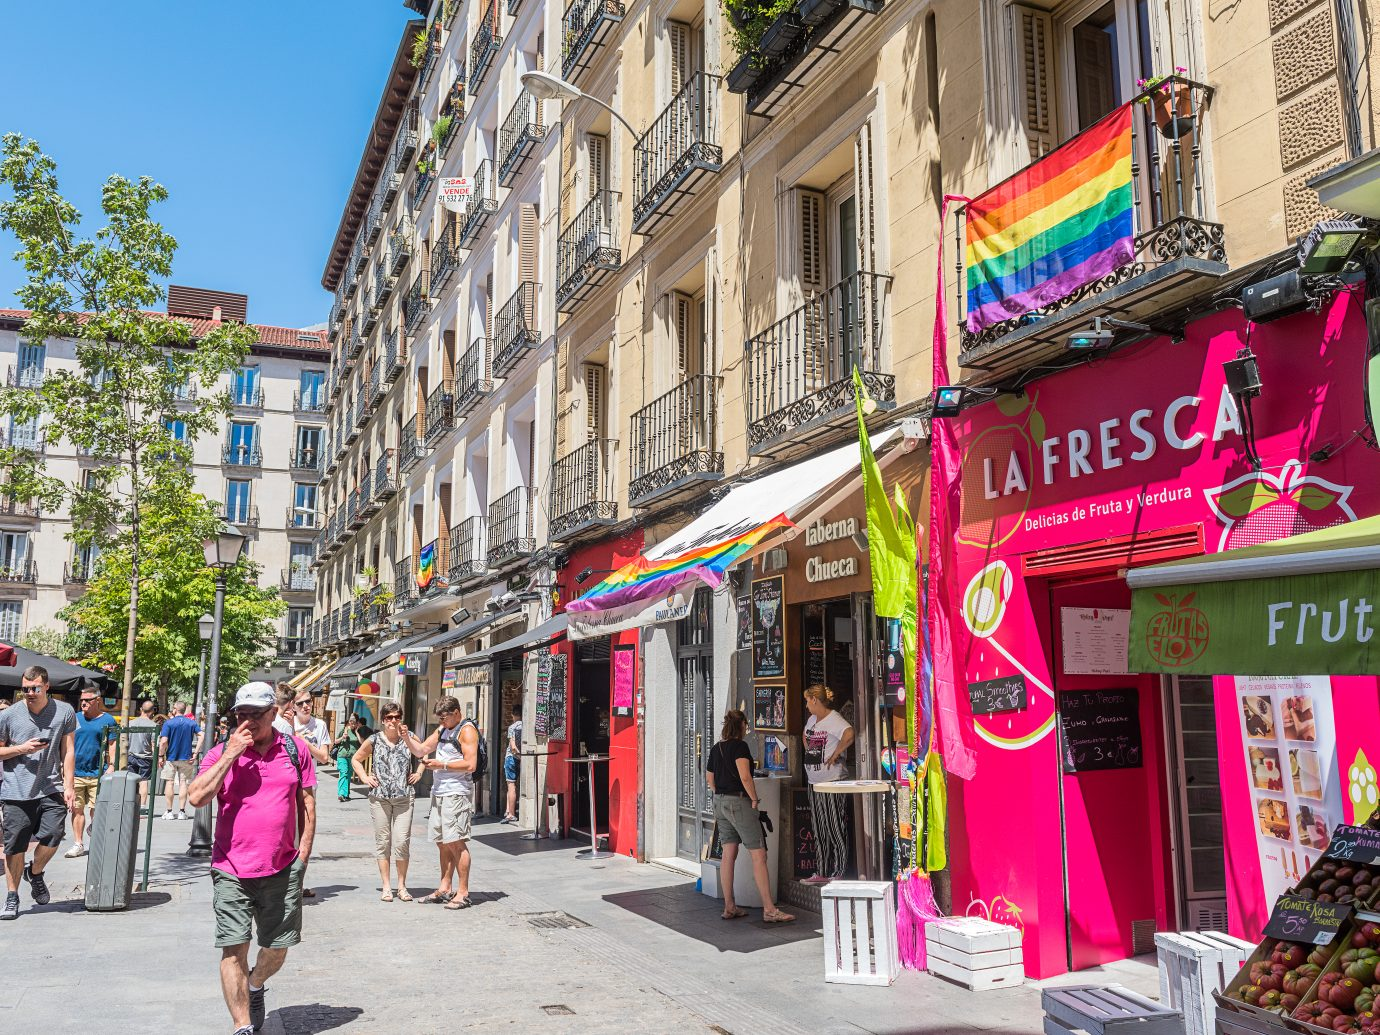 People walking around Chueca in Madrid